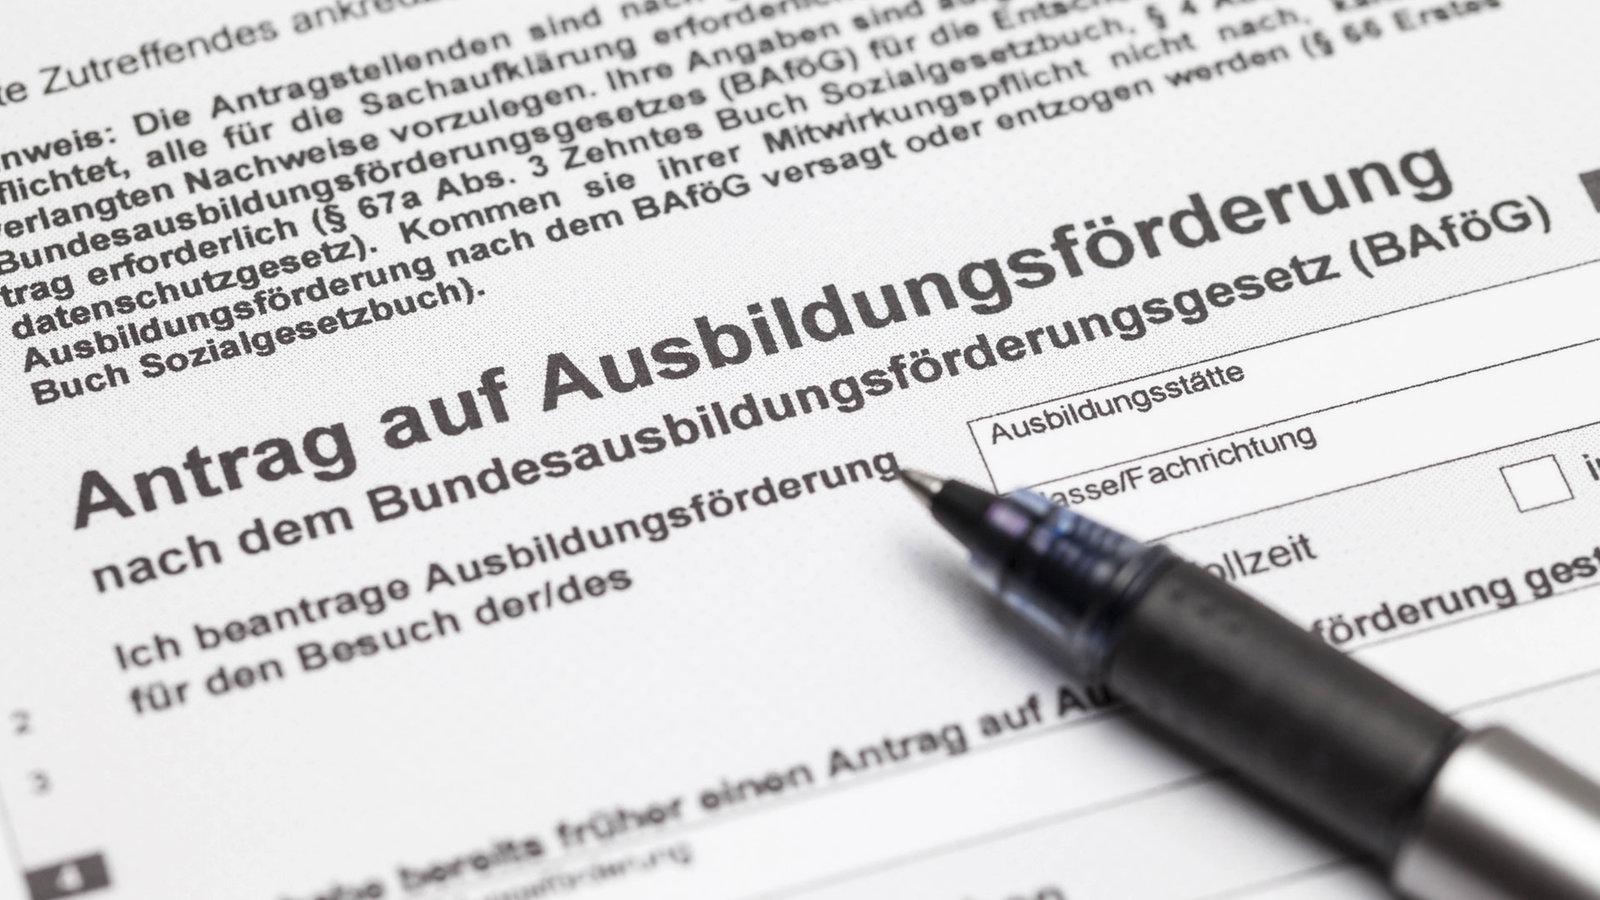 BAföG-Bündnis fordert Anpassung des BAföG an Lebensrealität der Studierenden